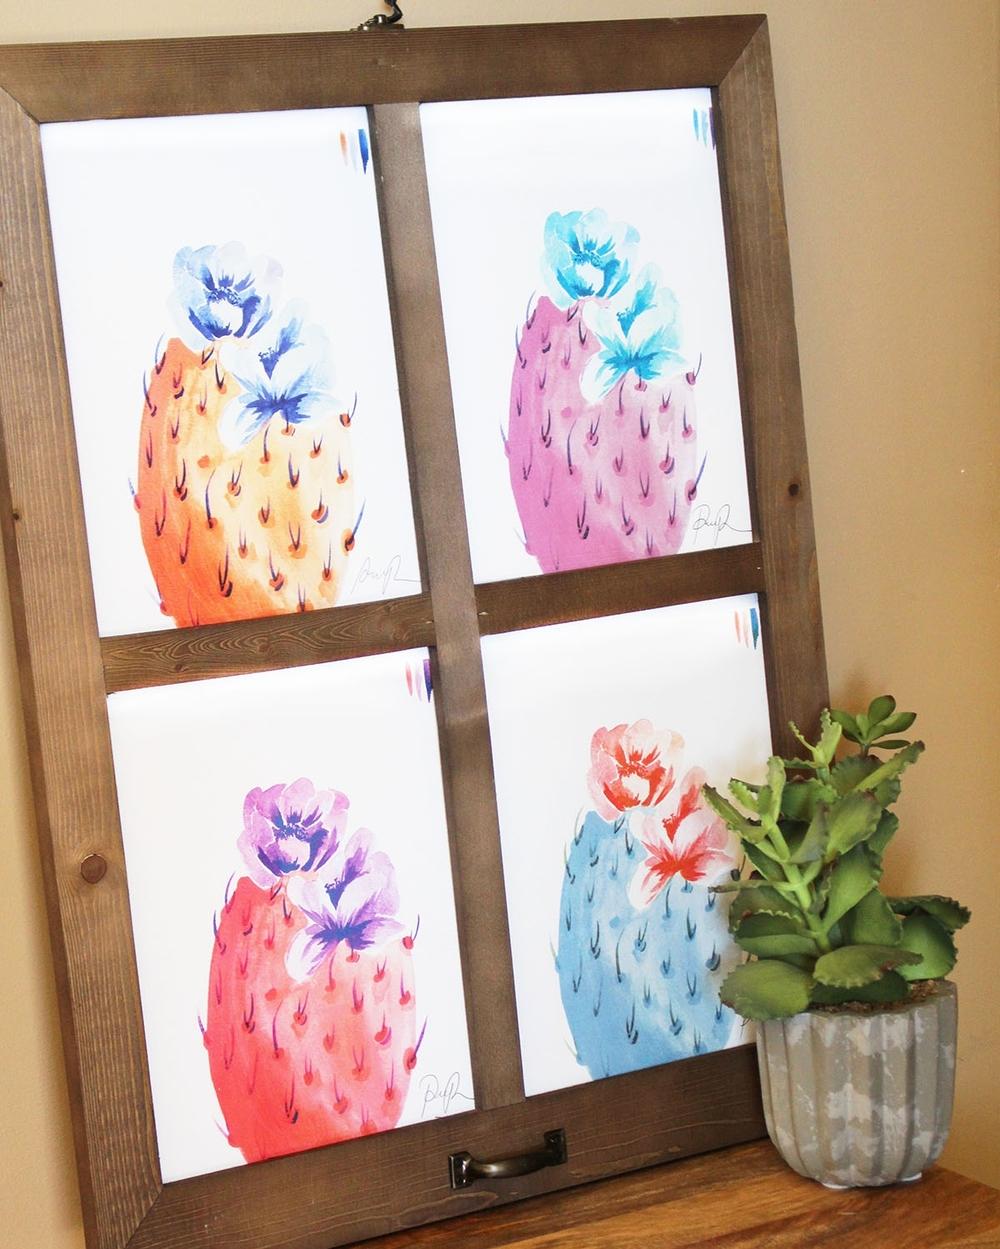 cactus window frame.jpg